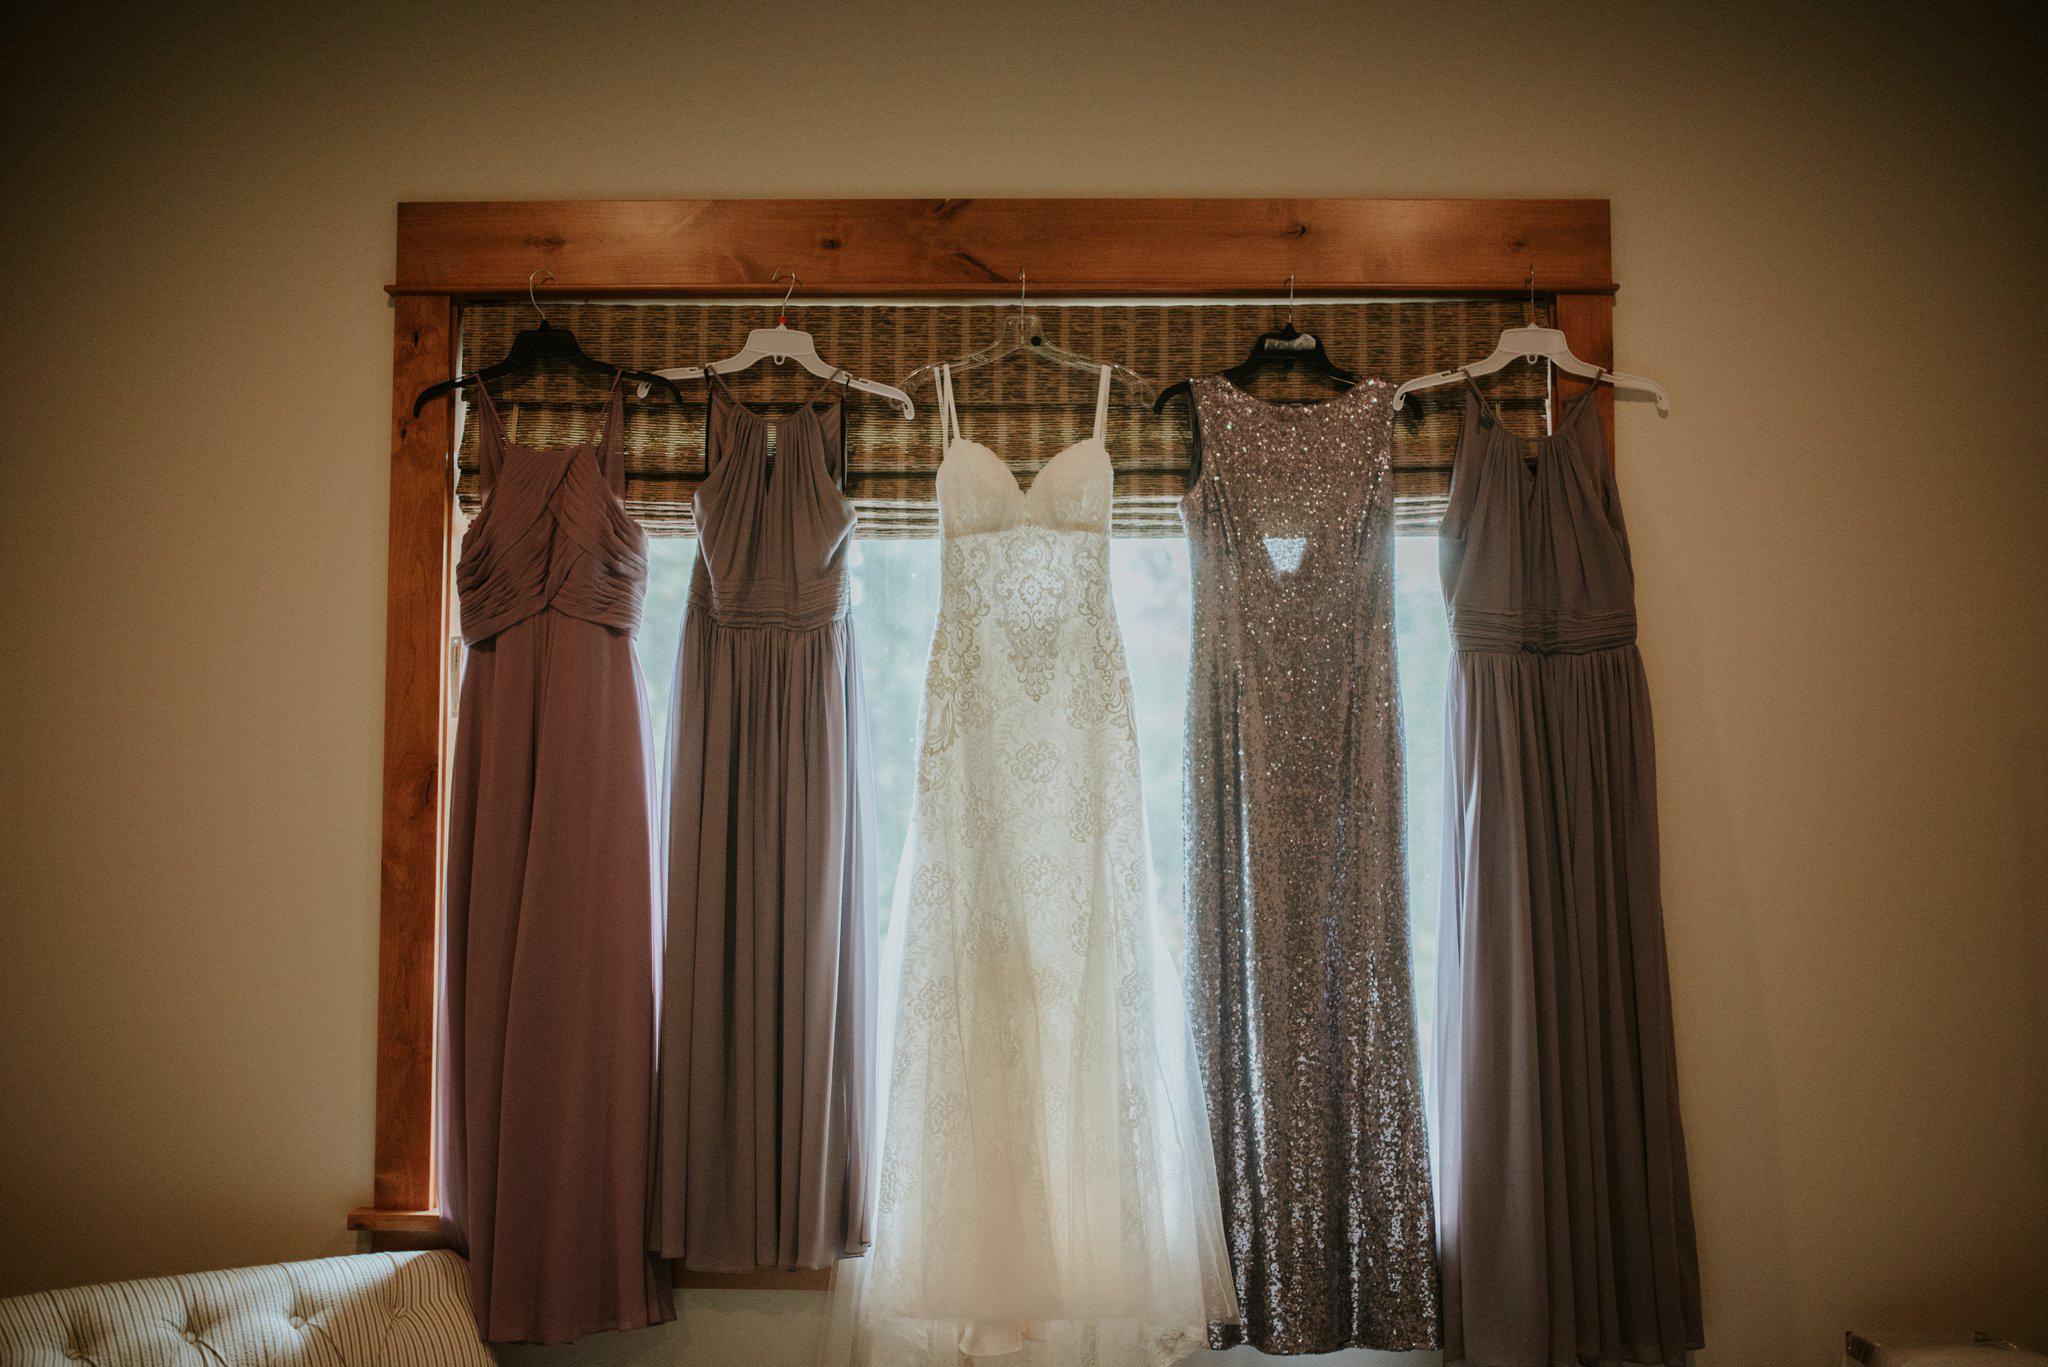 hollywood-school-house-wedding-seattle-photographer-caitlyn-nikula-5.jpg